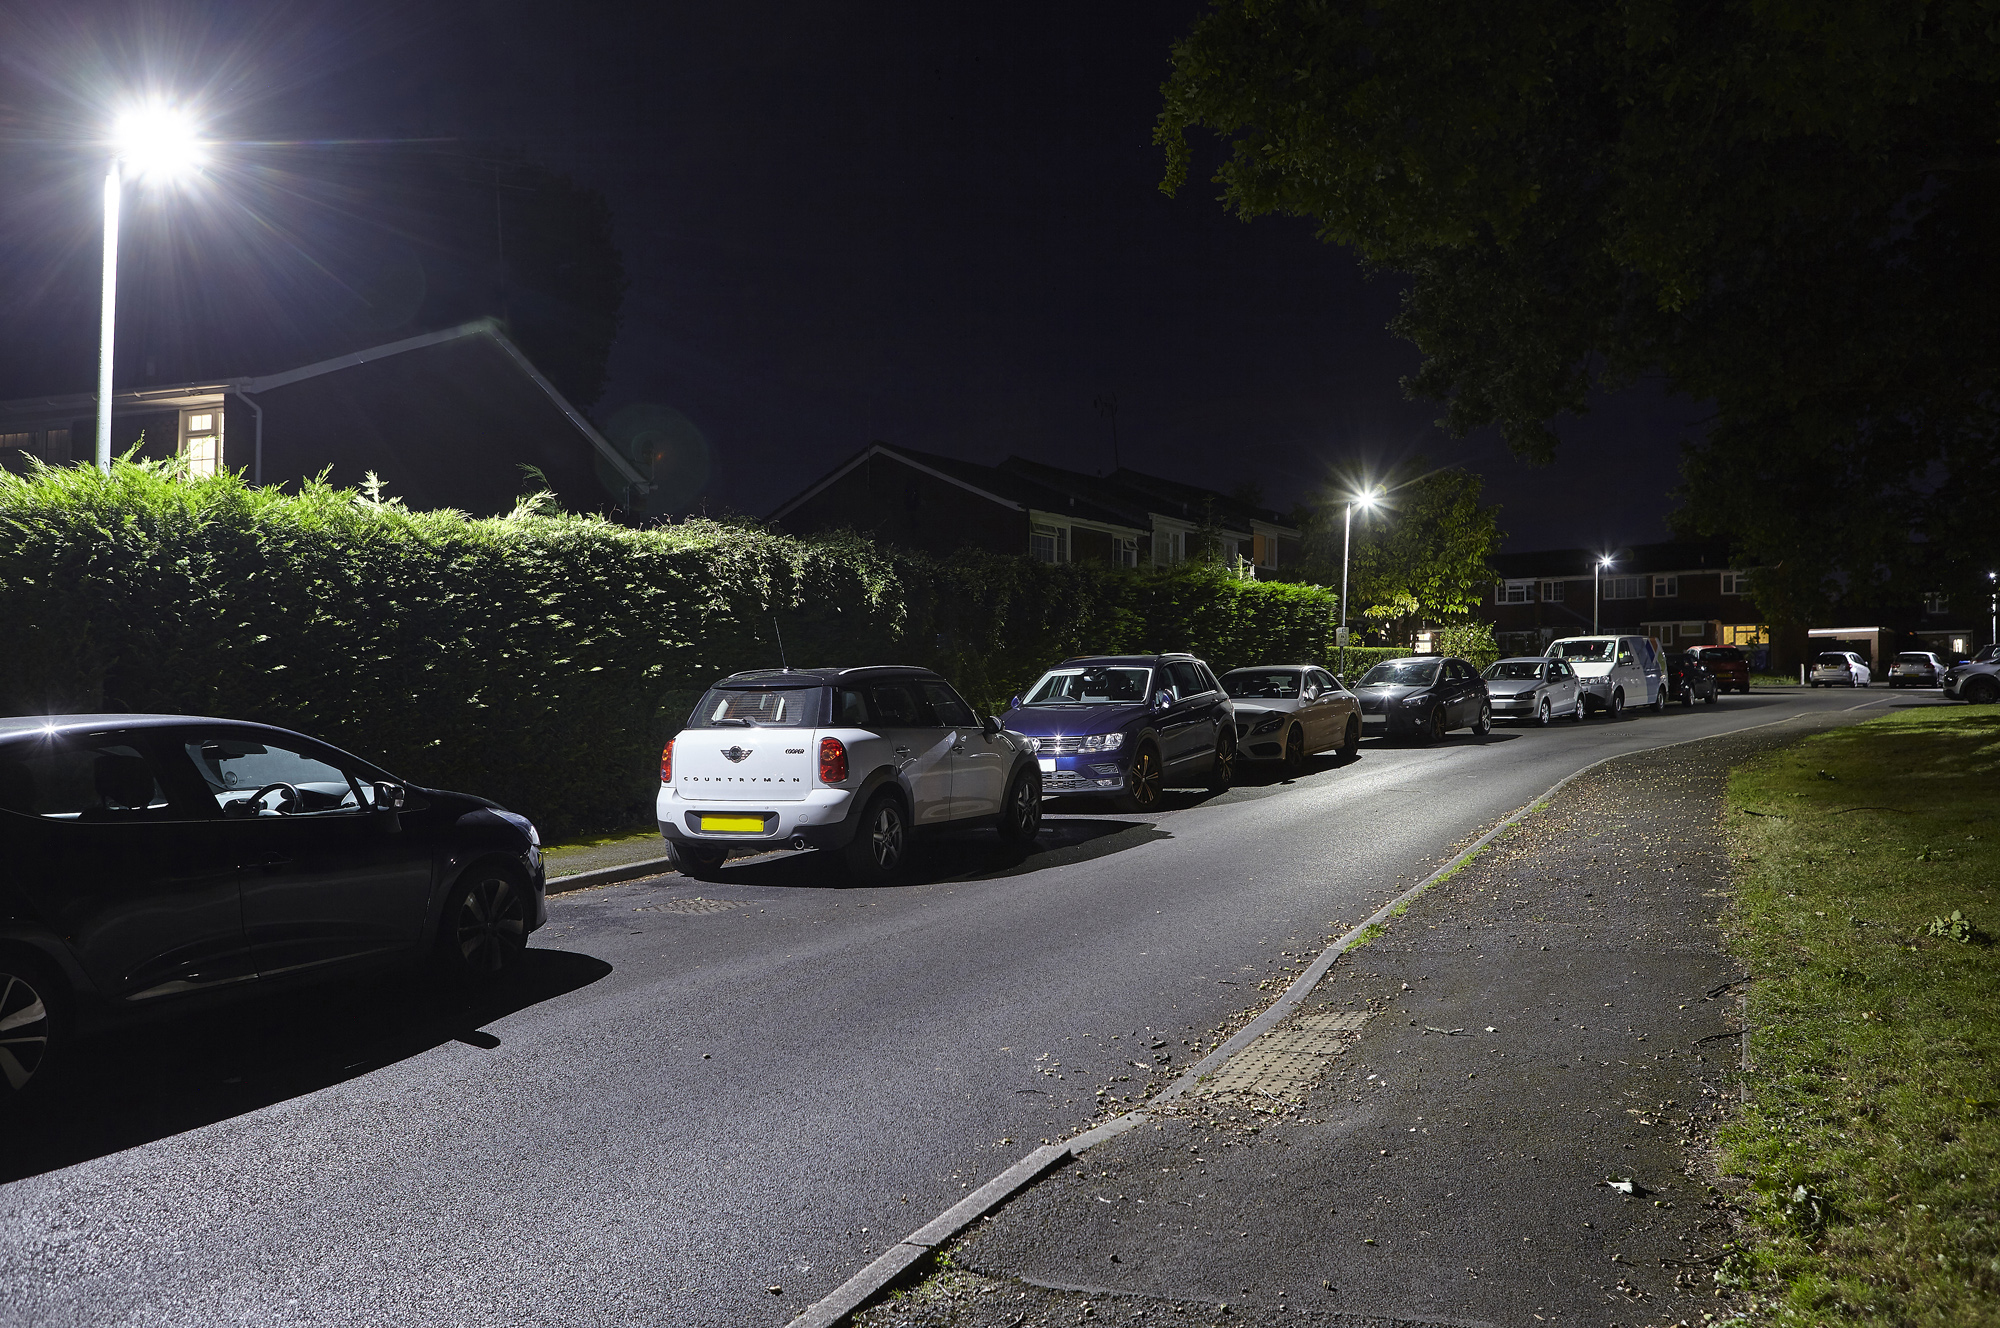 Royal Borough of Windsor and Maidenhead selects Zeta for LED street light upgrade